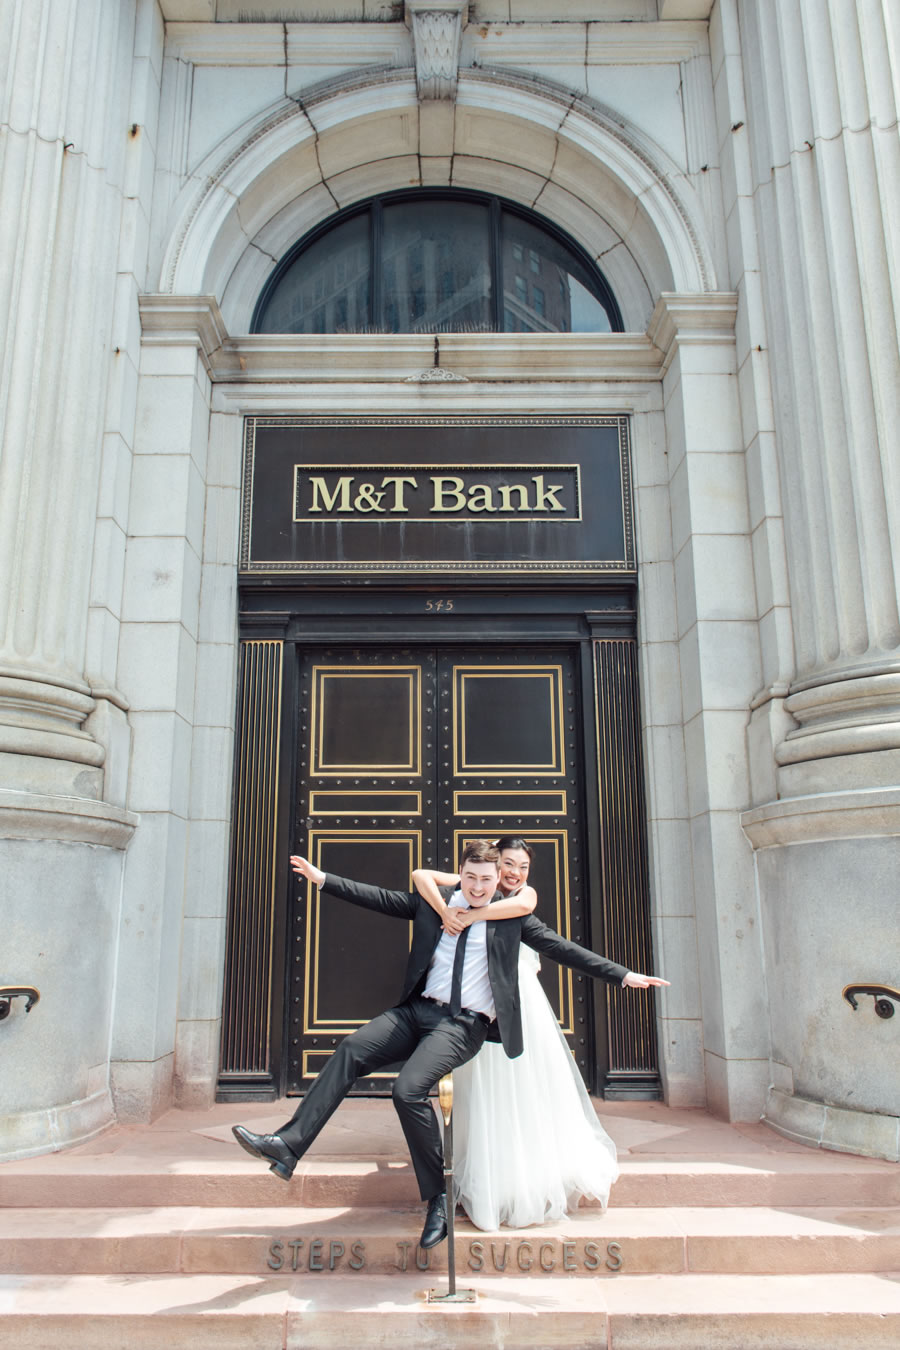 自助婚紗 海外婚紗 水牛城婚紗 | Sharon & Michael - 婚攝 Roger Wu